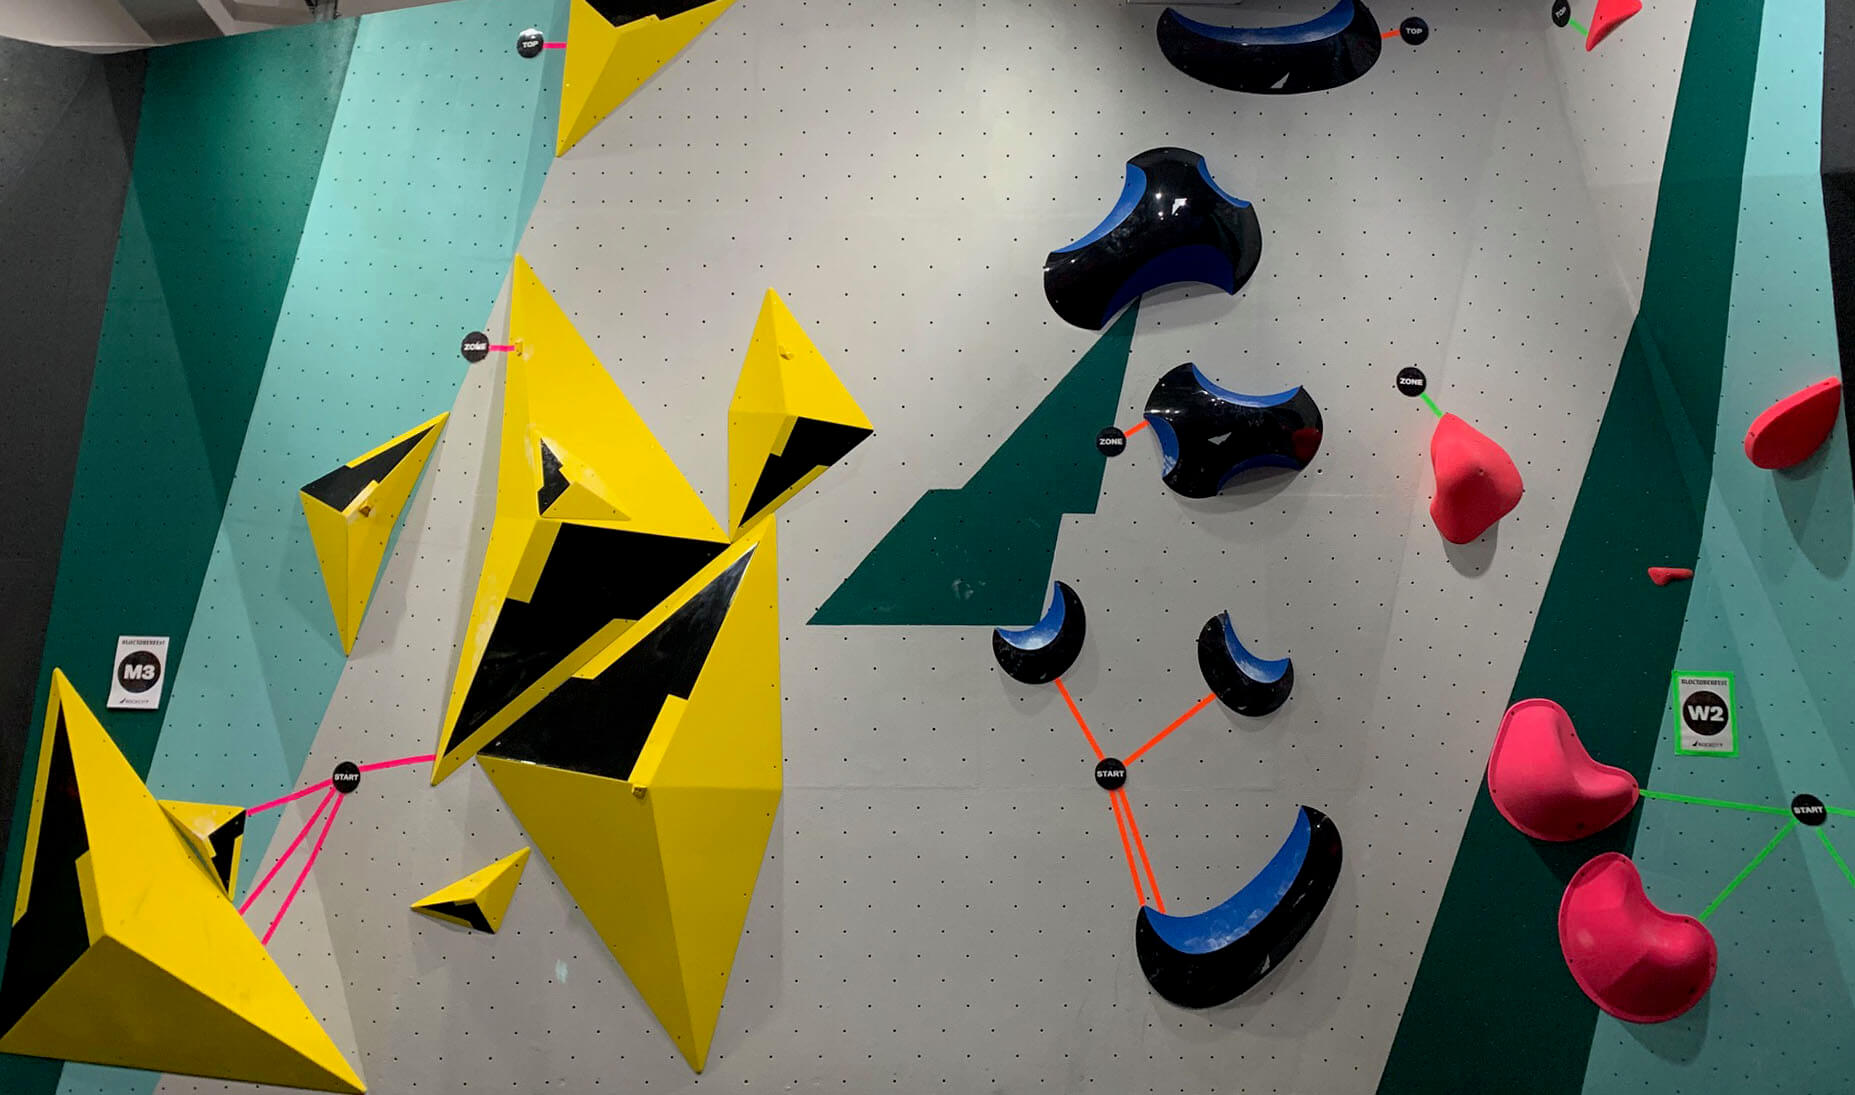 rockcity pro wall textured climbing wall piant - cyan grey - set wall